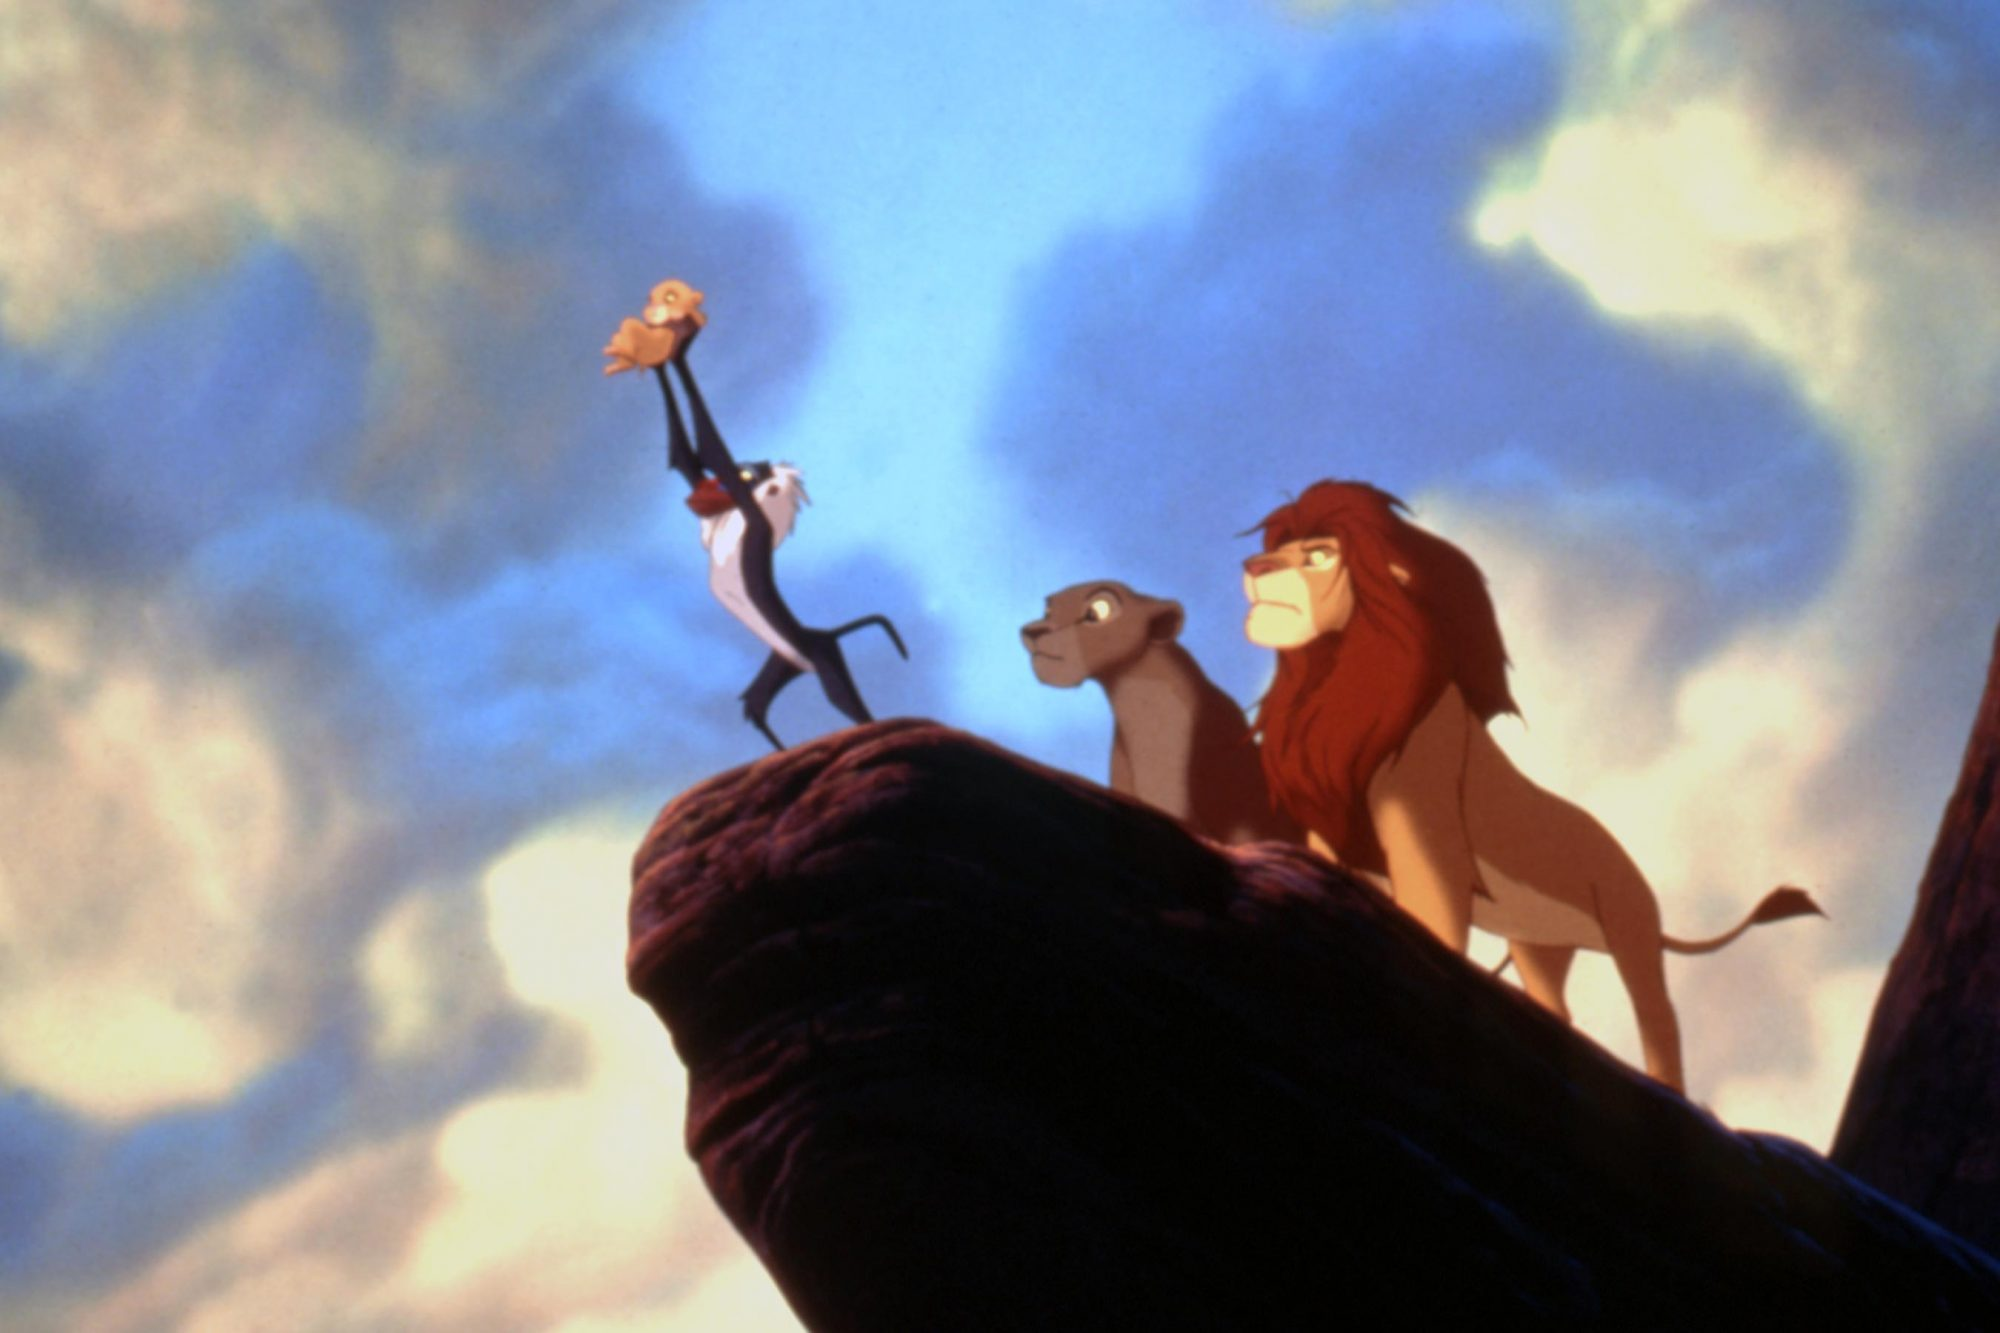 THE LION KING, Simba, Rafiki, Sarabi, Mufasa, 1994, (c)Buena Vista Pictures/courtesy Everett Collect